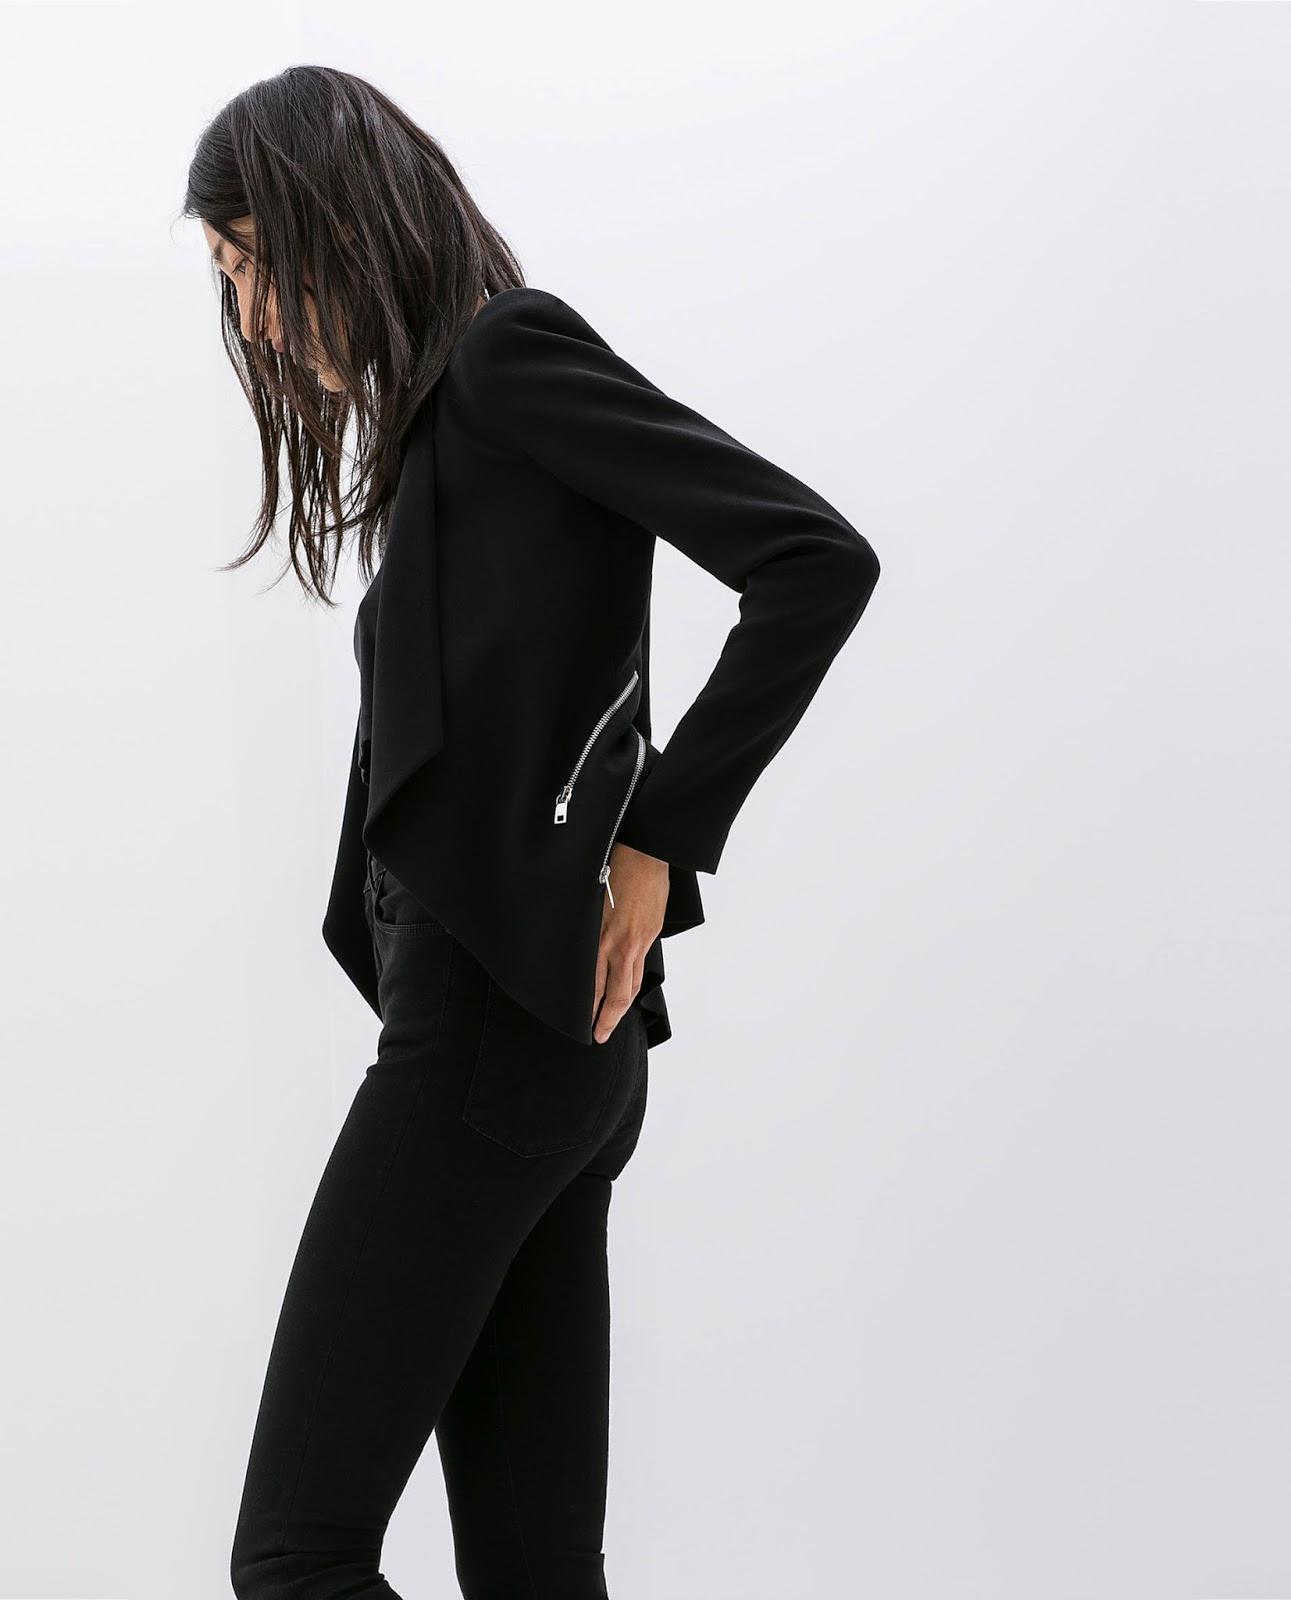 Total look en Negro Zara, Cazadora con cremalleras, pitillos, street style